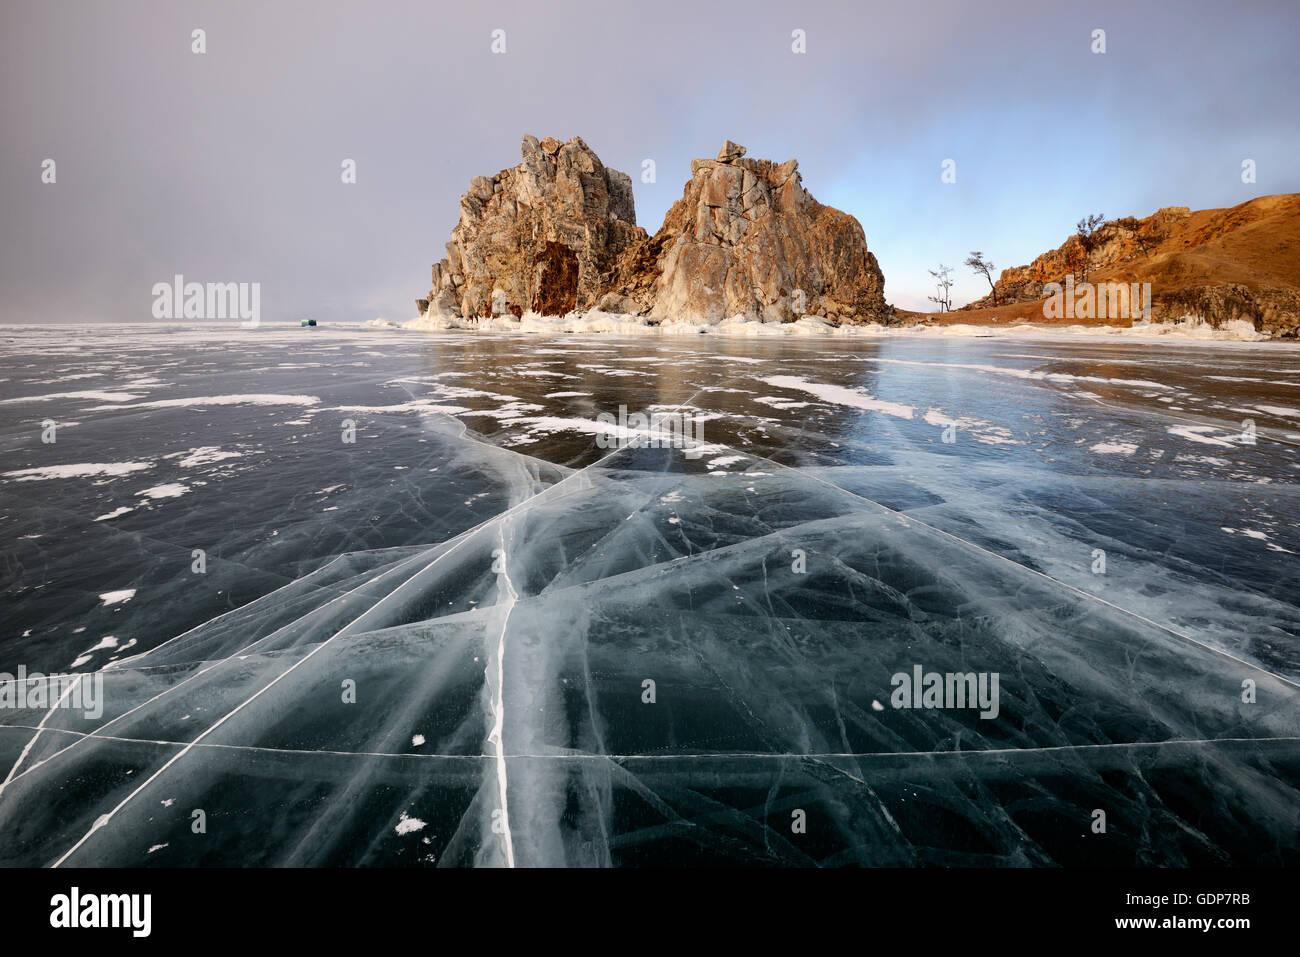 Vista de hielo y roca Shamanka Burkhan Cape, el lago Baikal, Isla Olkhon, Siberia, Rusia Imagen De Stock